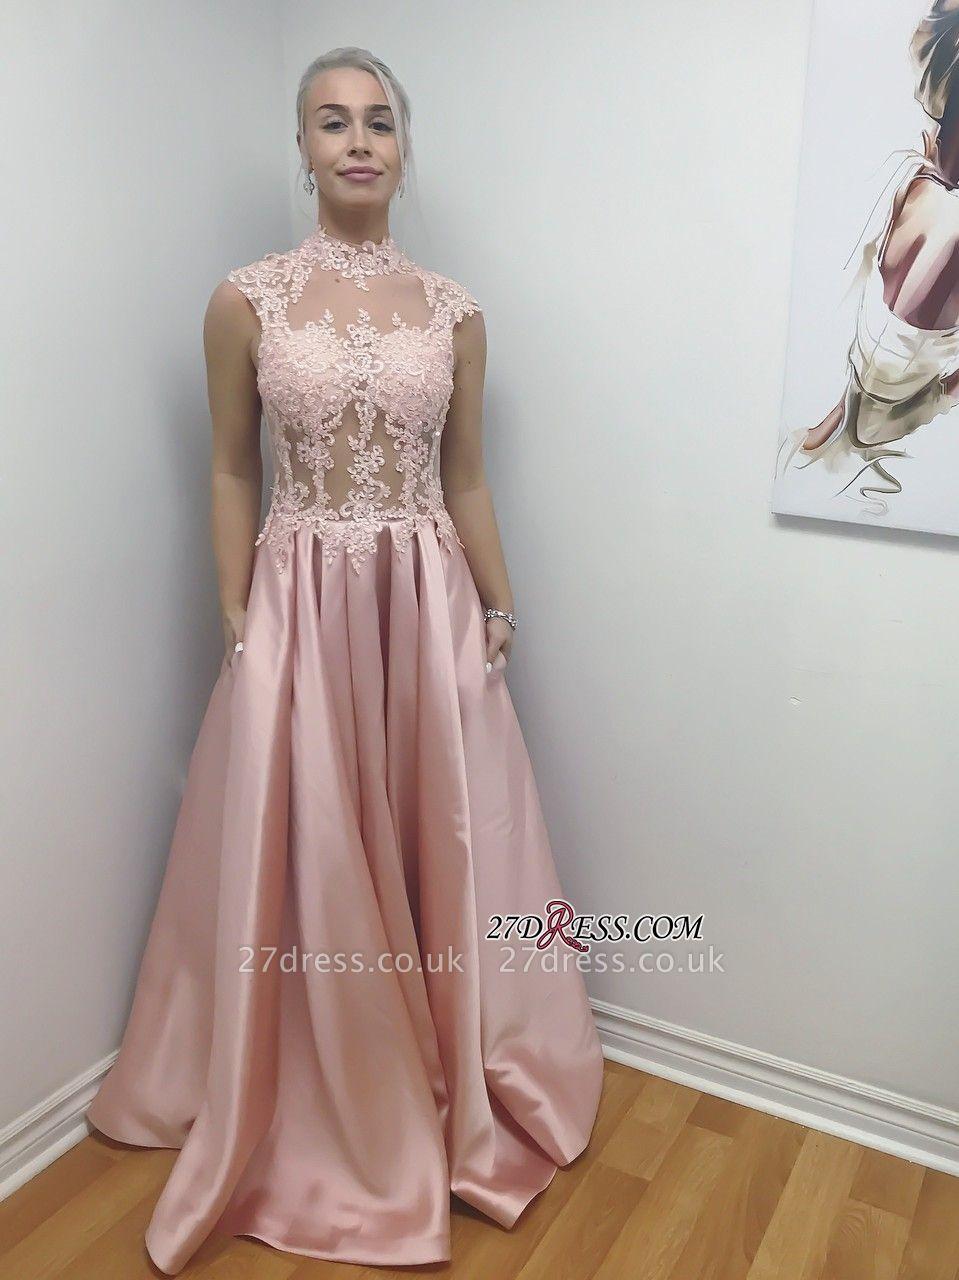 Long Illusion Chic Lace-Applique Bodice High-Neck A-Line Prom Dress UKes UK